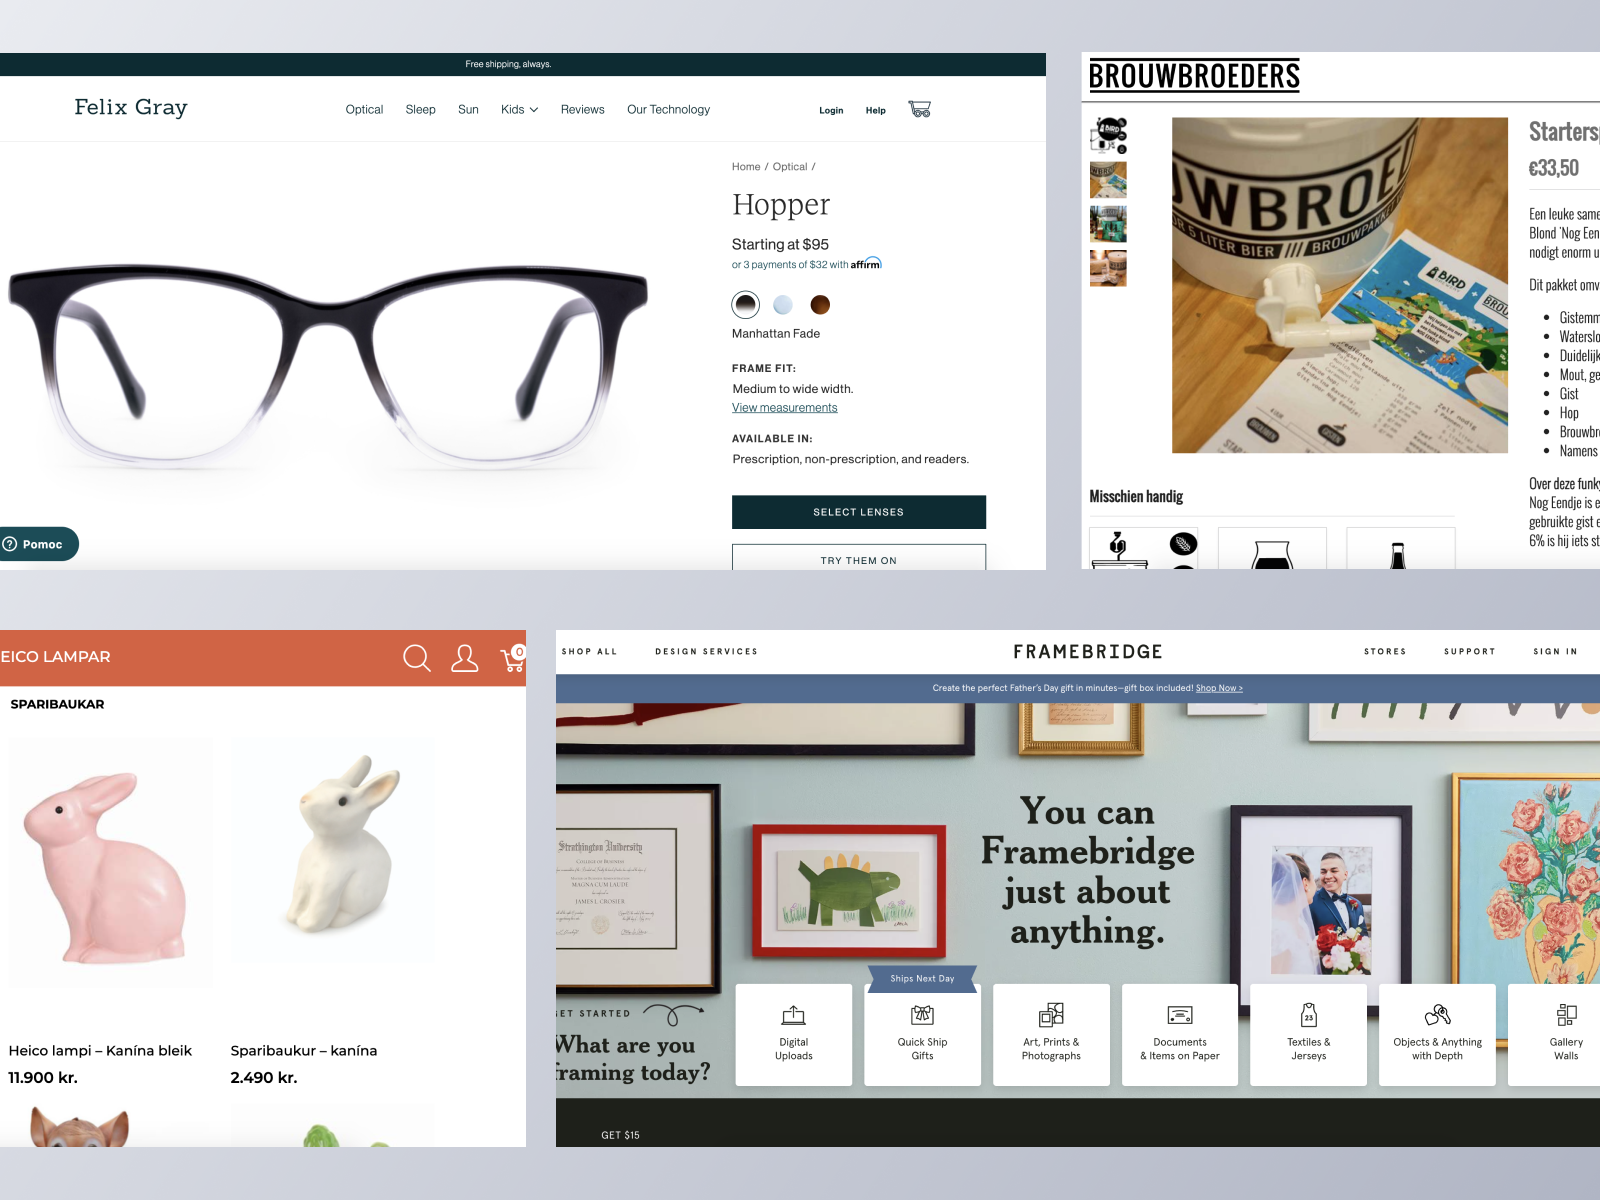 ecommerce websites using Spree Commerce